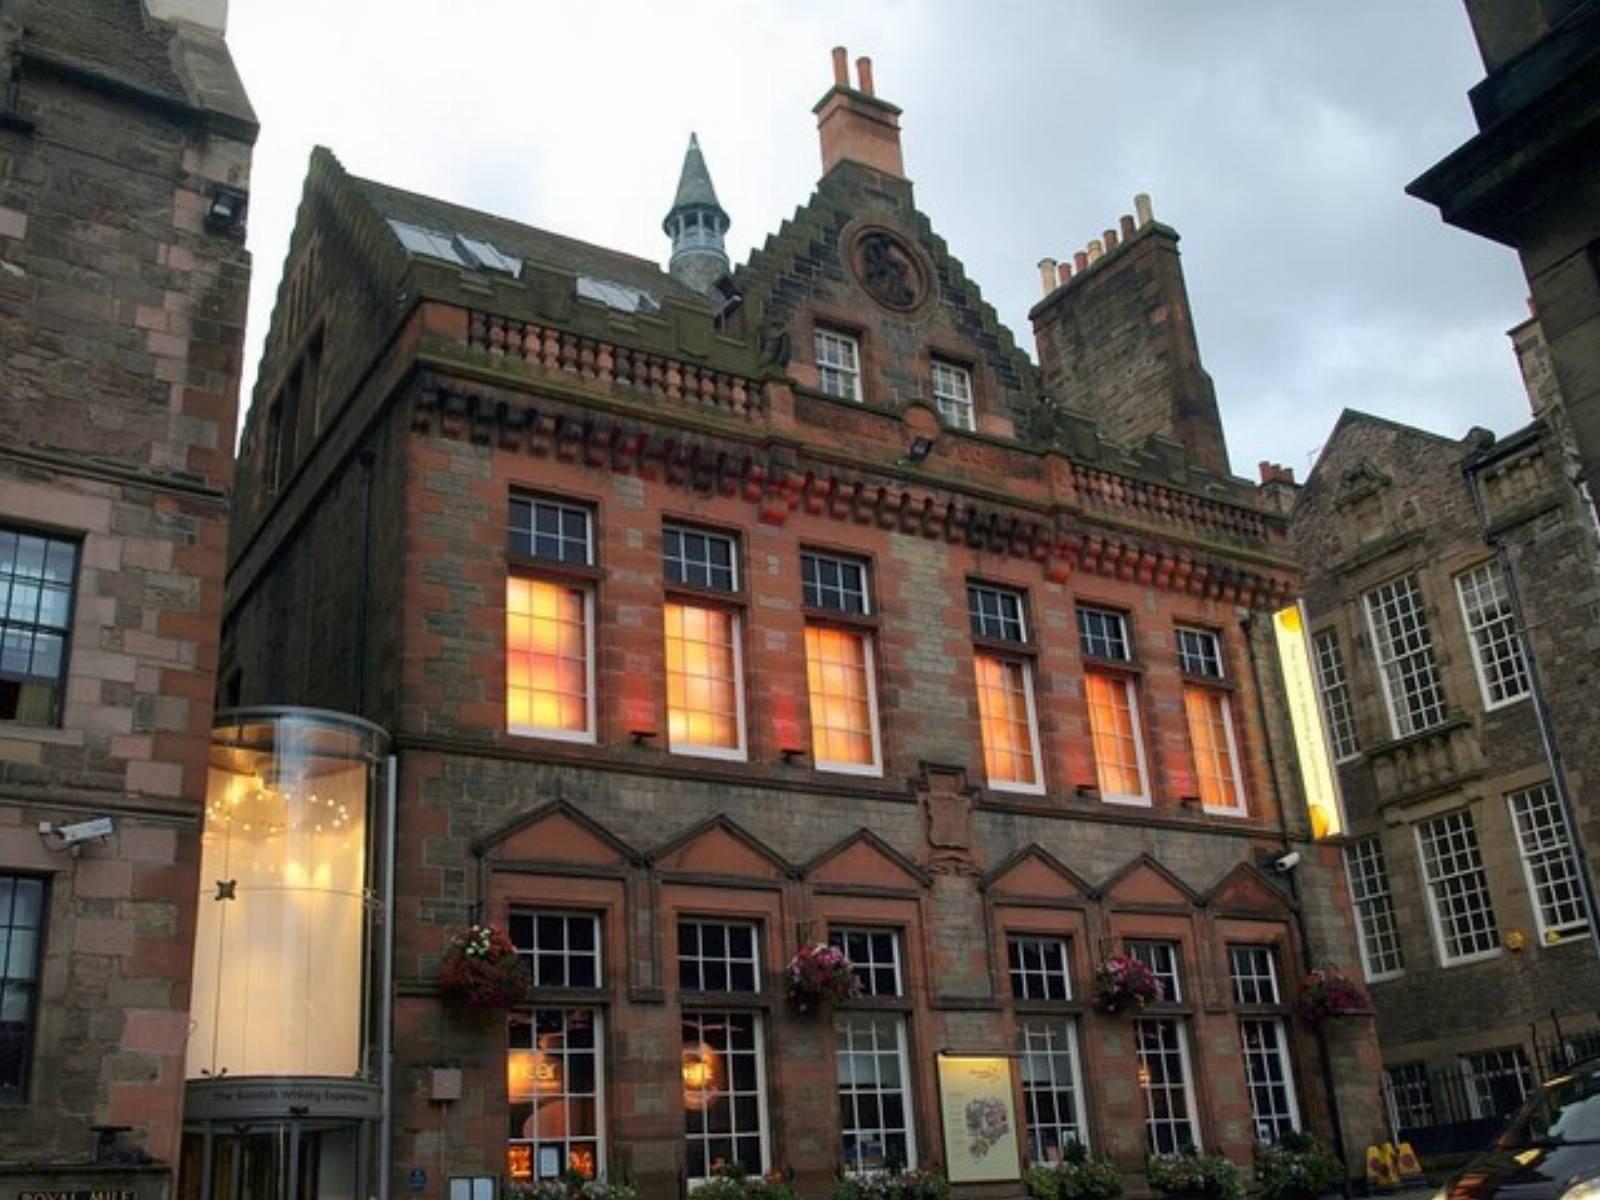 Scotch Whisky Heritage Centre, źródło: http://commons.wikimedia.org